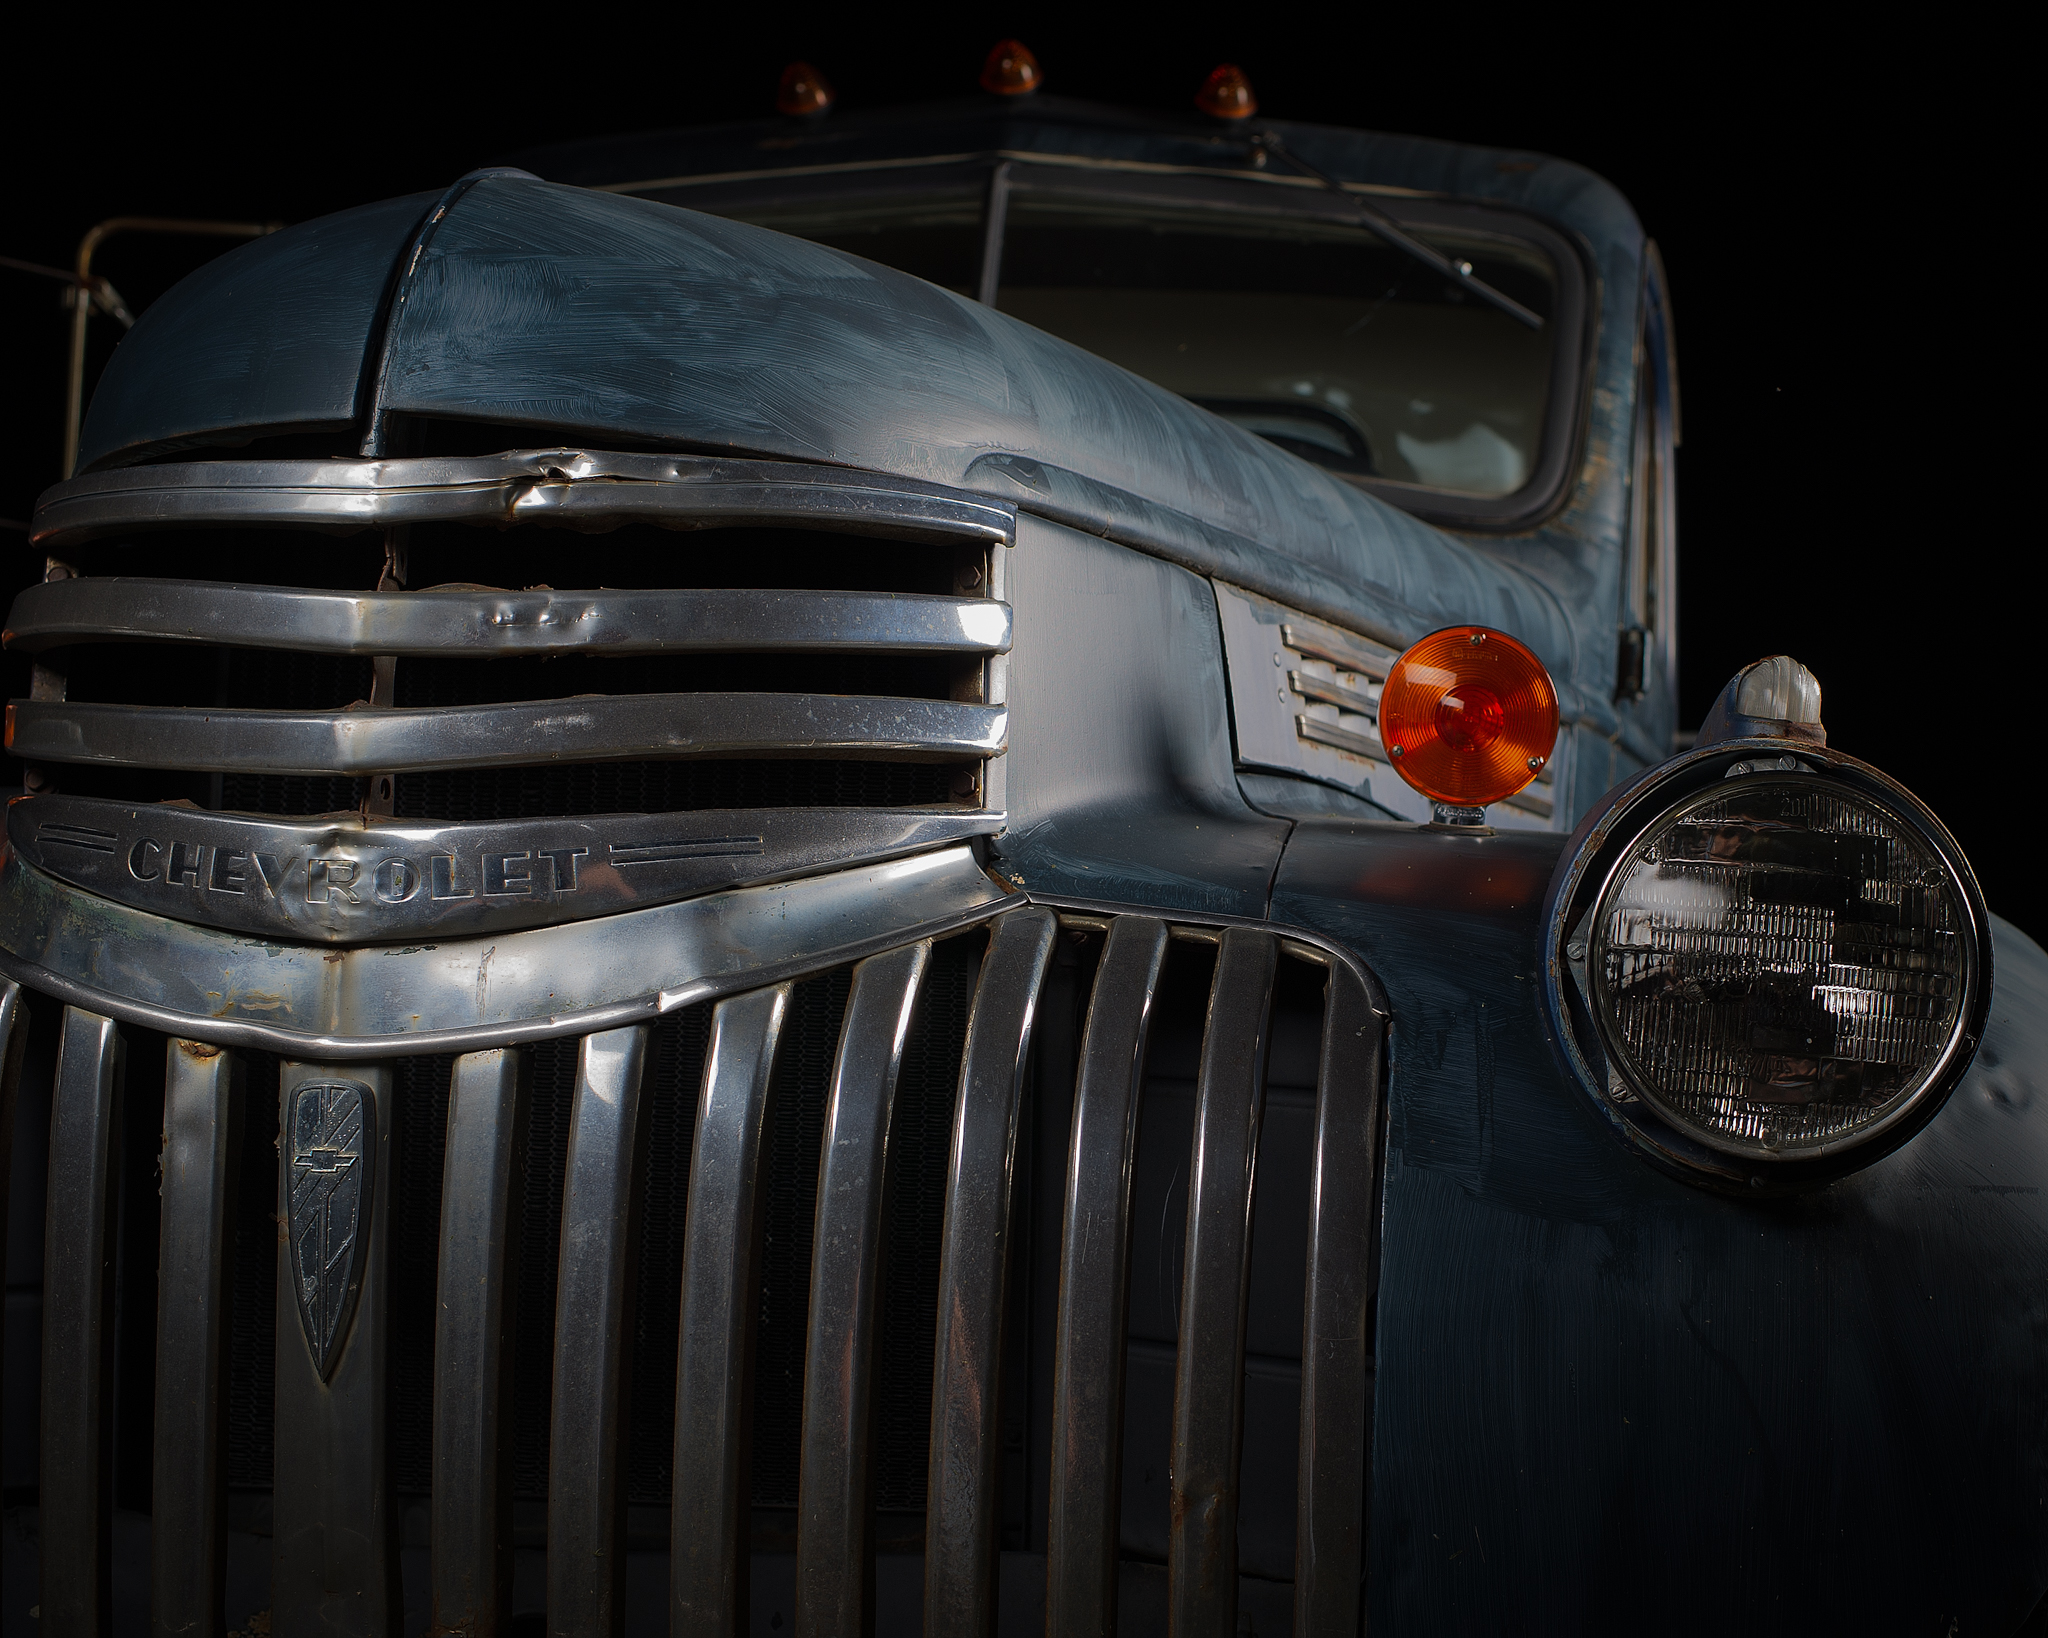 1946 Chevrolet Truck #1